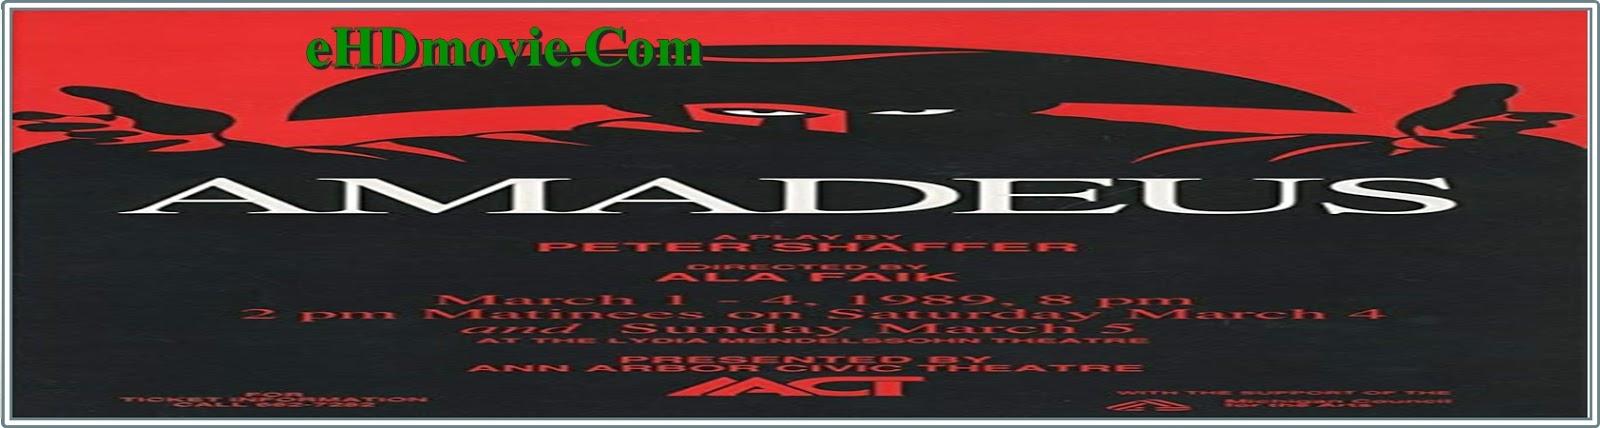 Amadeus 1984 Full Movie English 720p - 480p ORG BRRip 750MB - 1.5GB ESubs Free Download